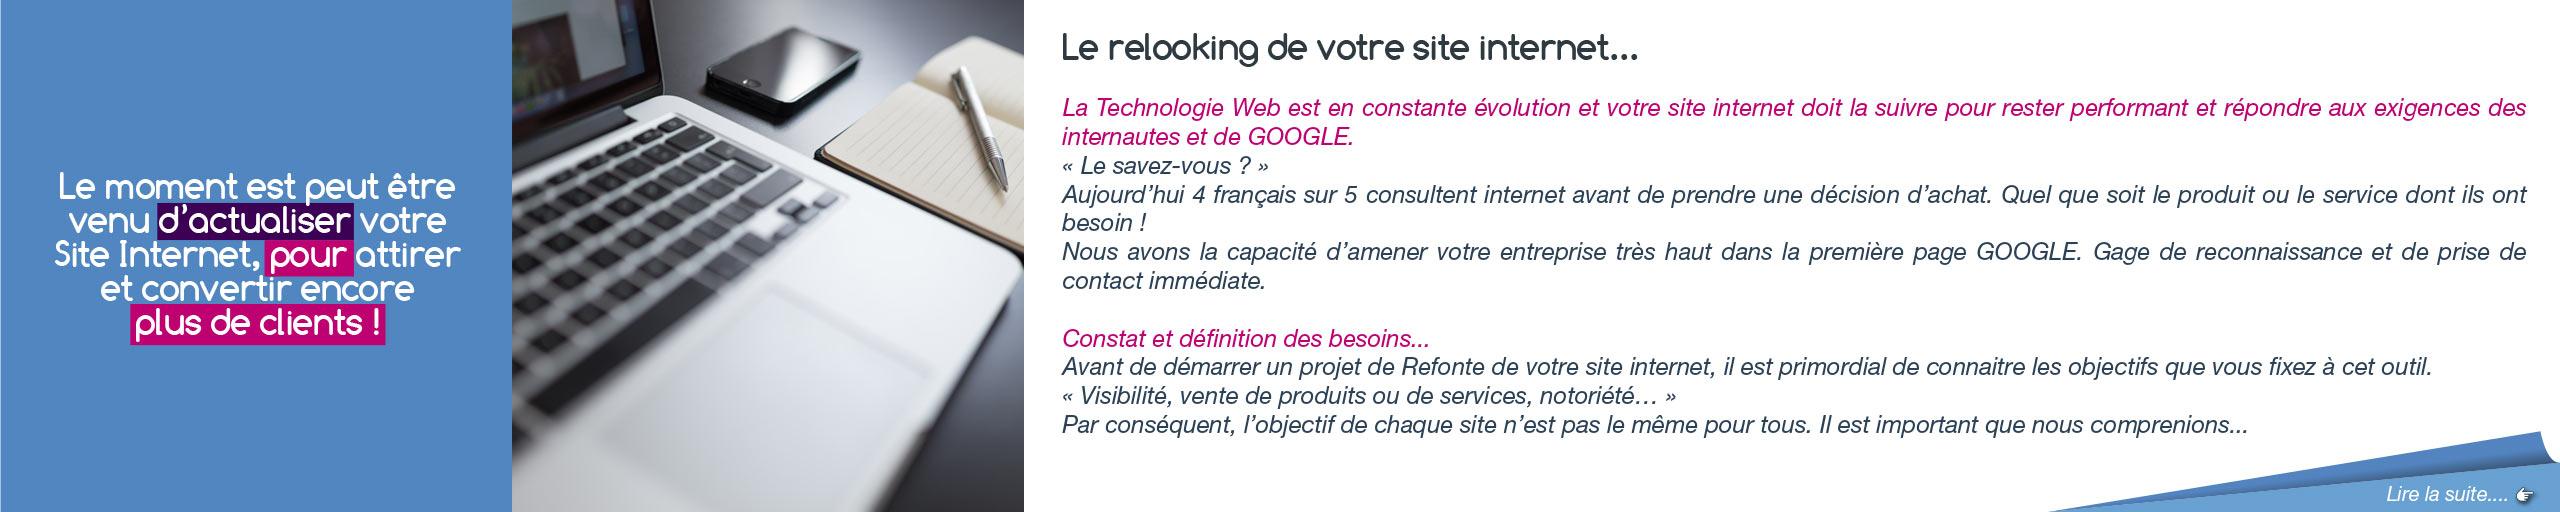 Site Internet - Refonte